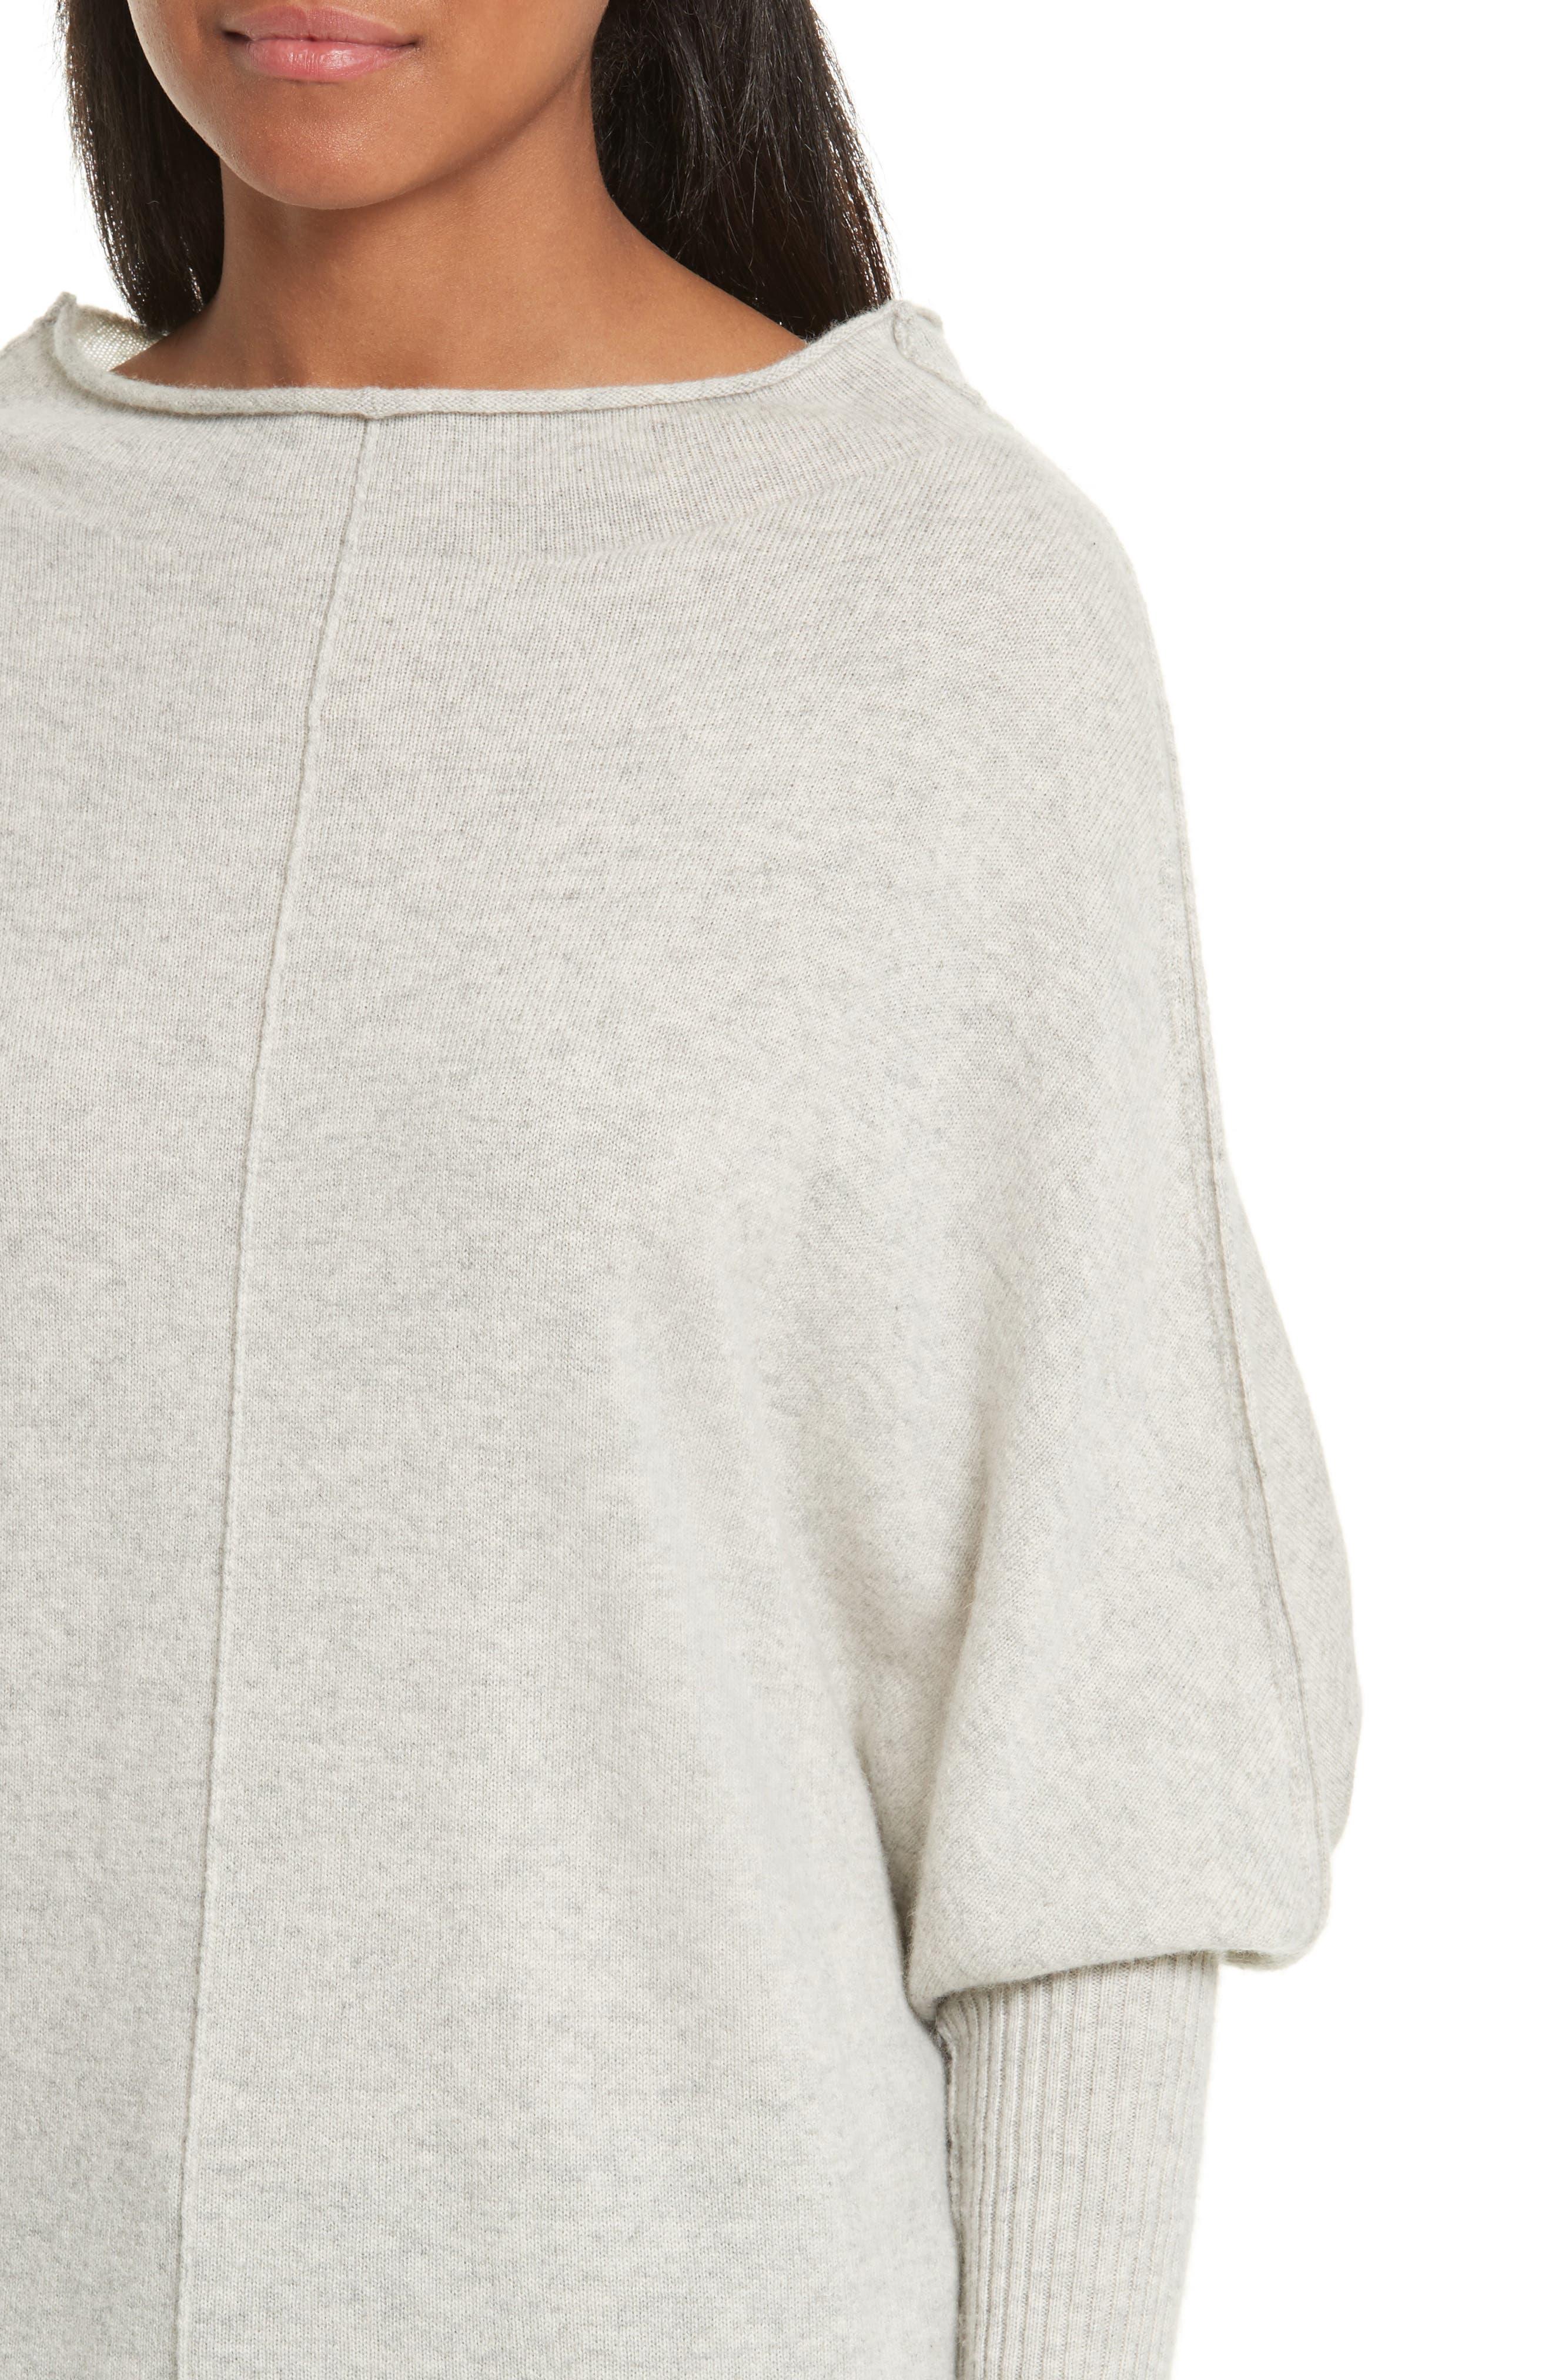 Rosalie Cashmere Sweater,                             Alternate thumbnail 4, color,